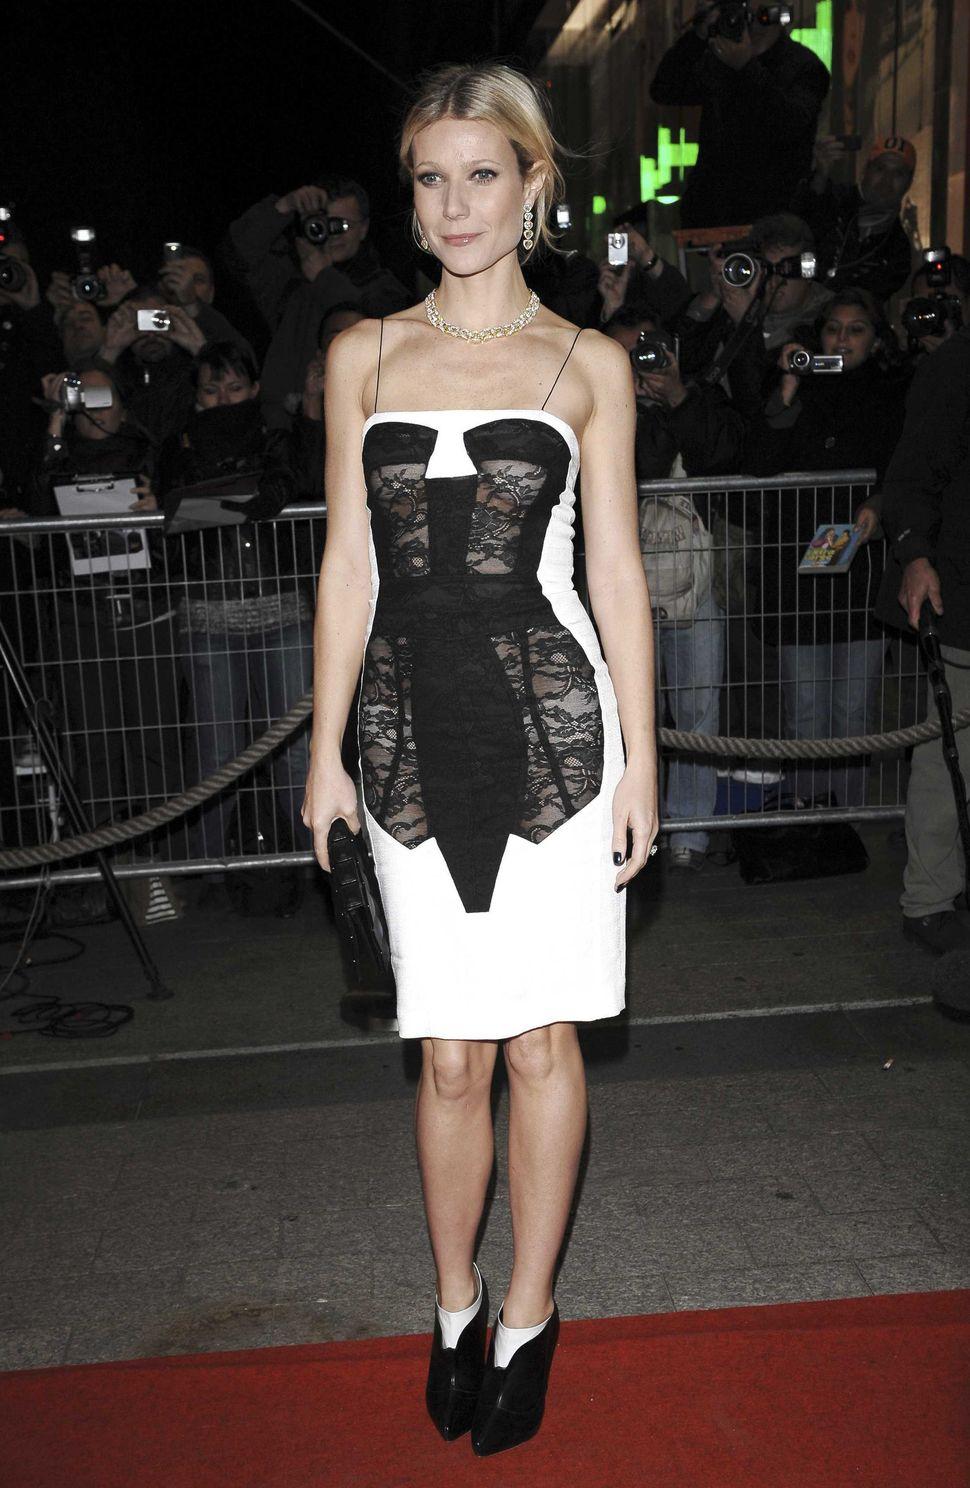 A trompe loeil corset dress designed by Antonio Berardi and worn by Gwyneth Paltrow, 2009.